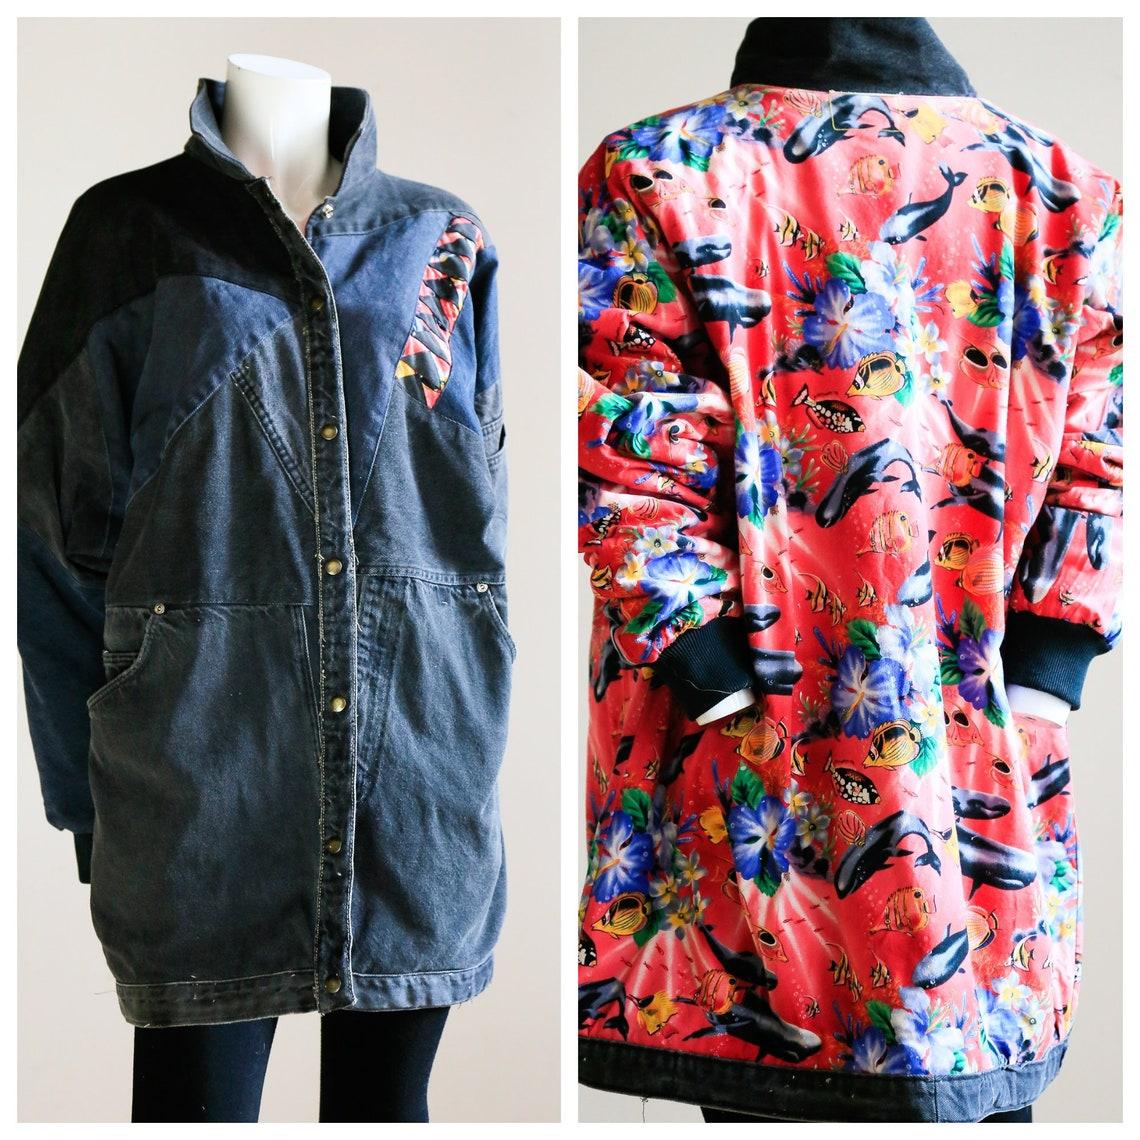 Reversible Deconstructed Denim Jacket | Reworked Pink Fish Print Lining Black Patchwork Ooak